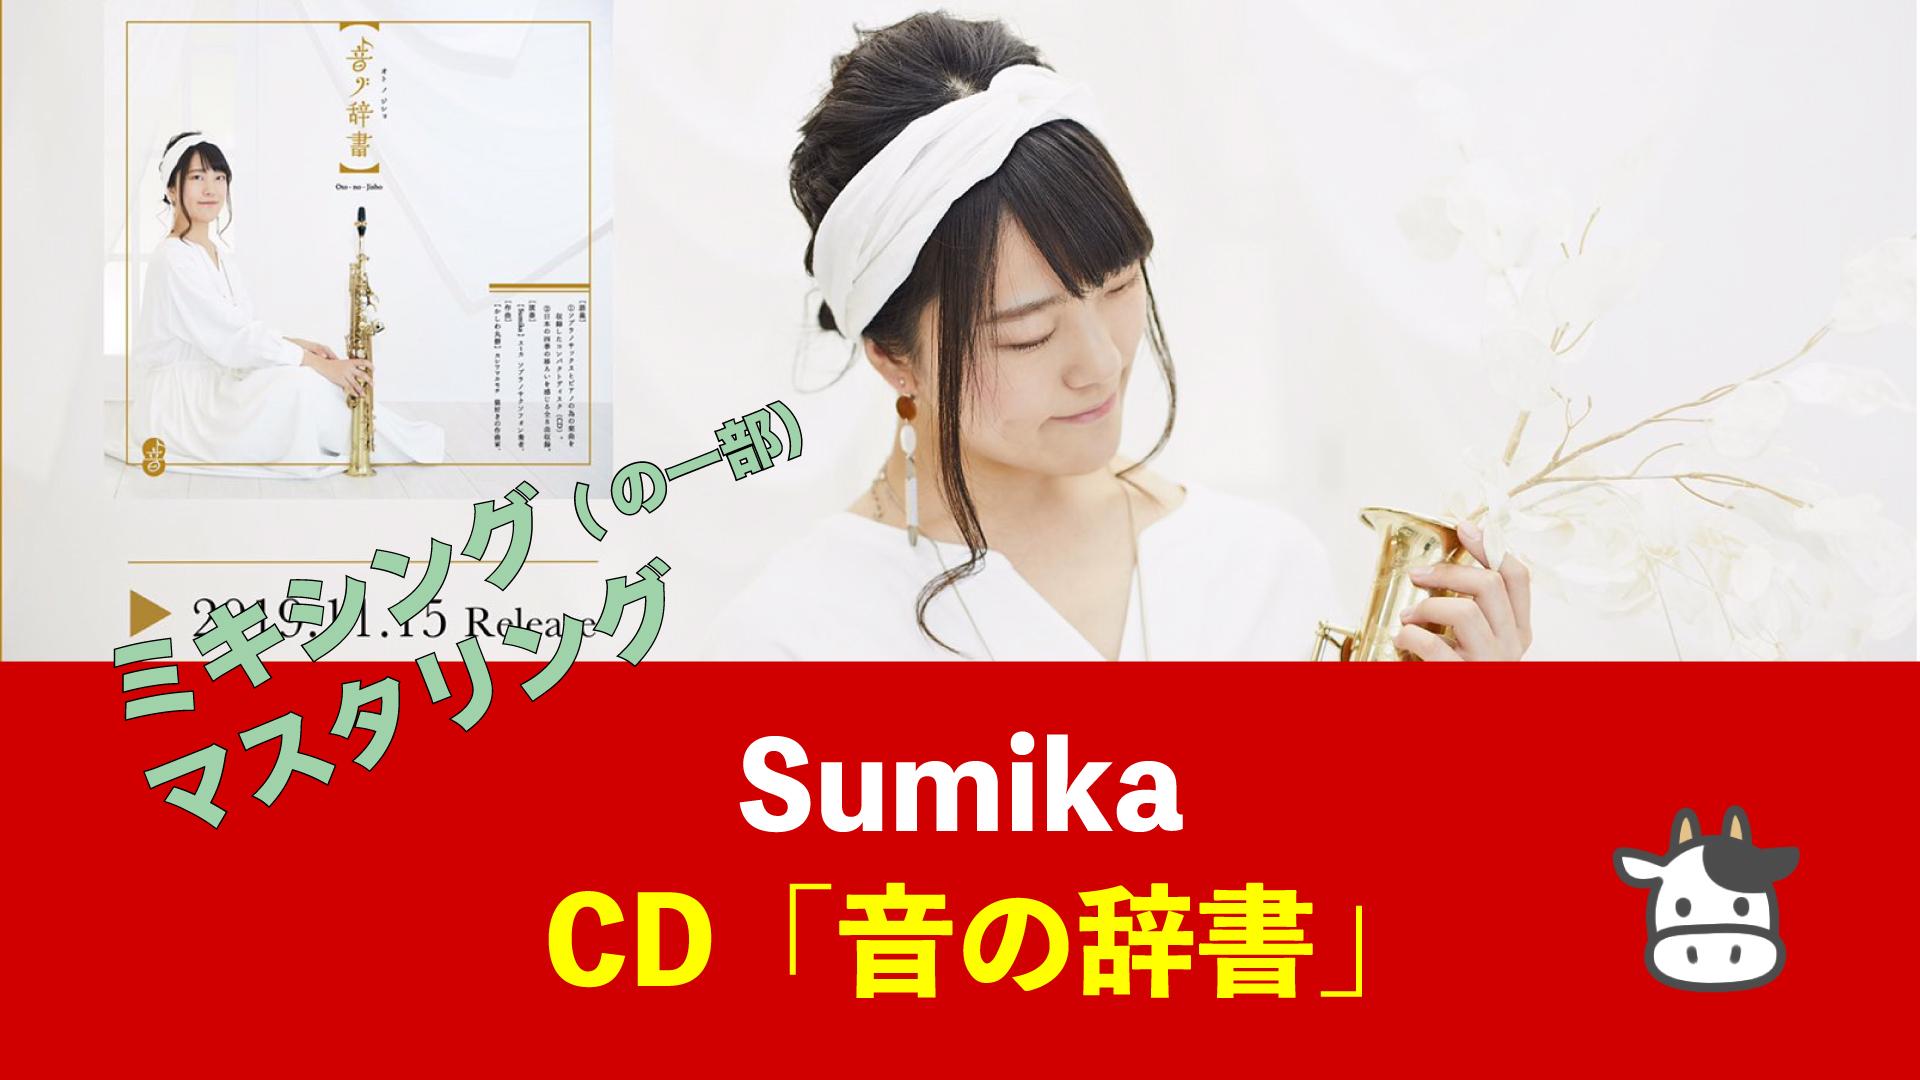 Sumika 音の辞書